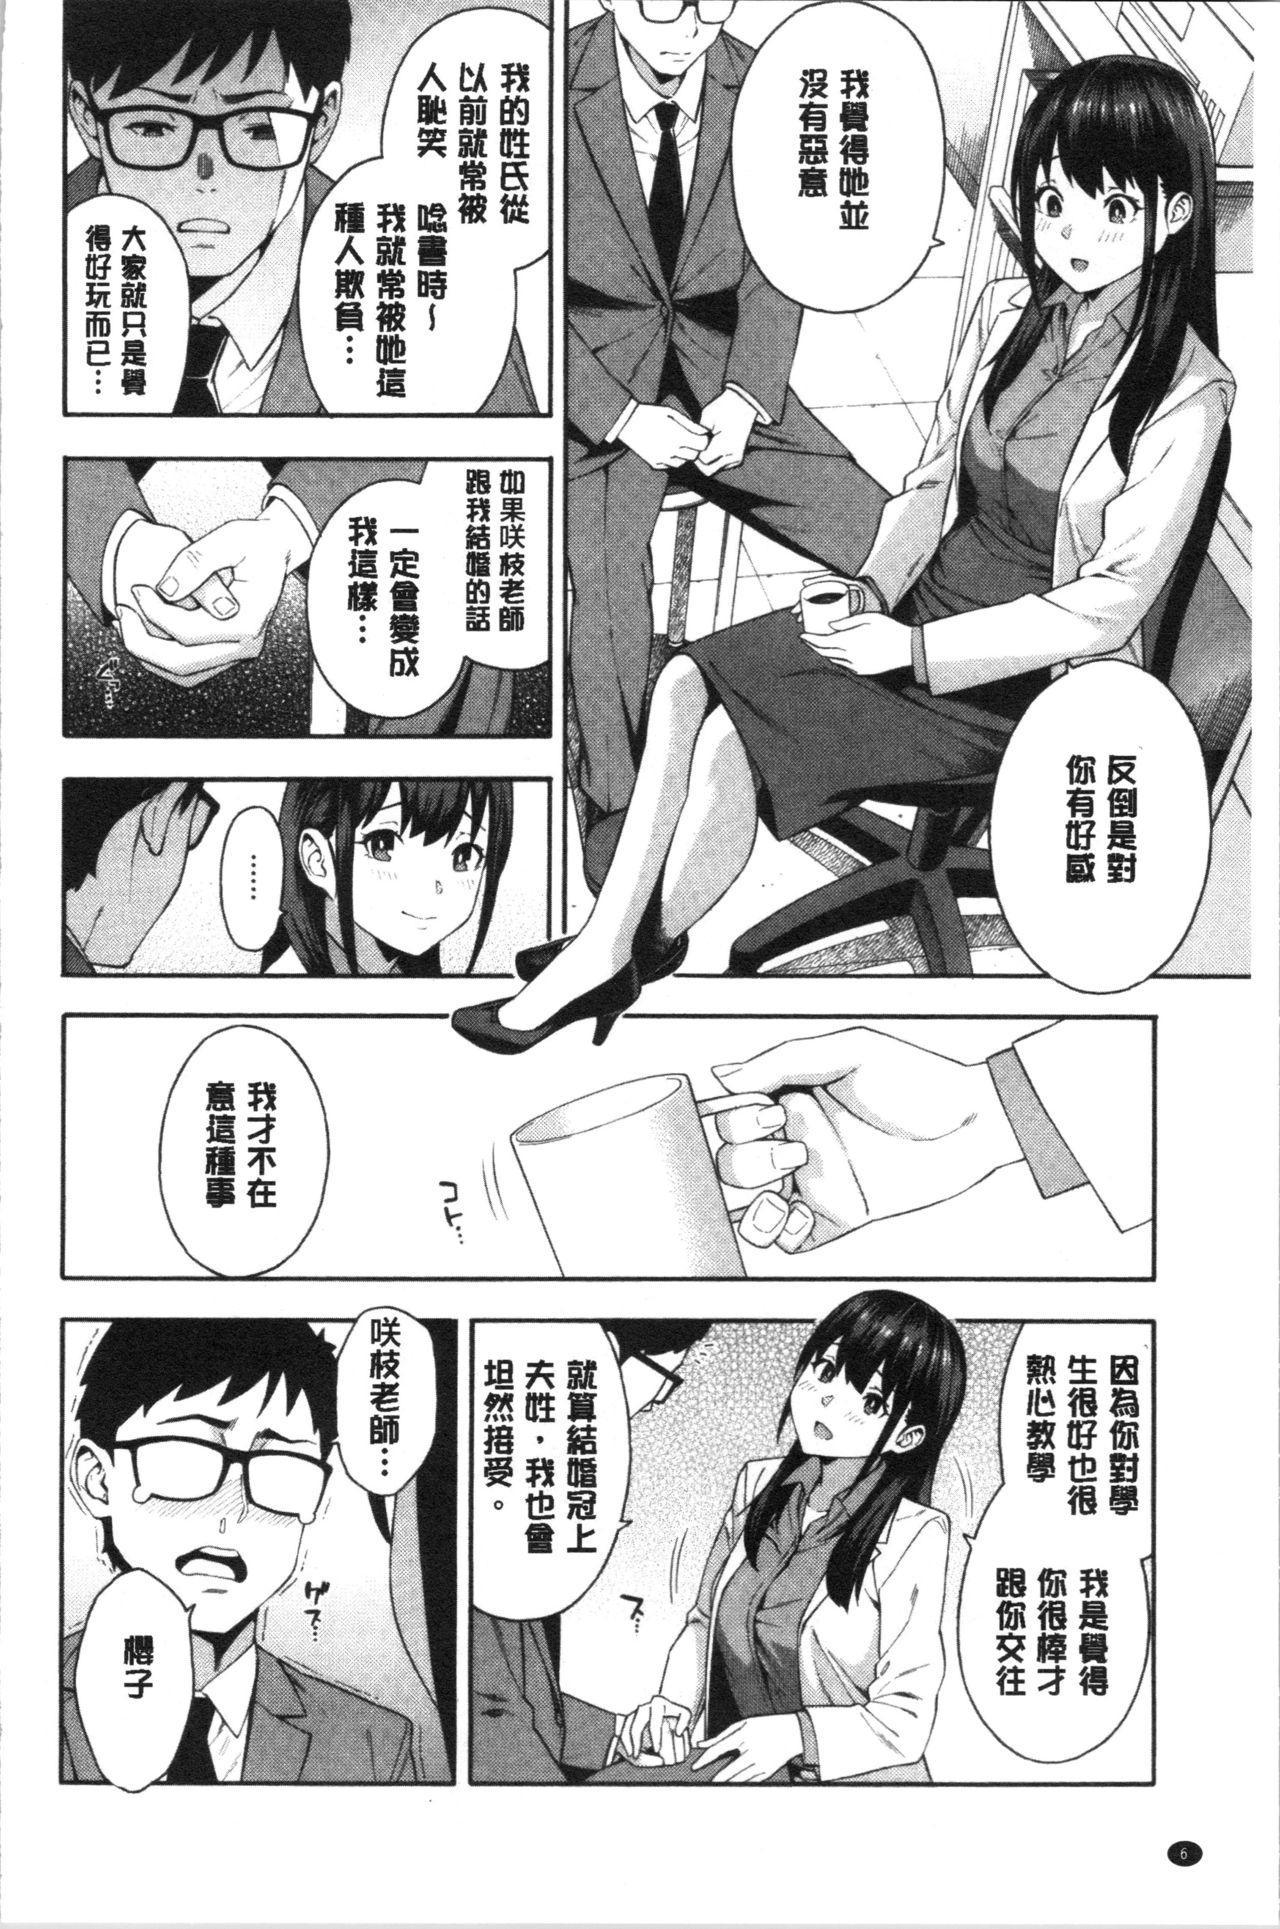 Okashite Ageru | 讓你來侵犯我 8